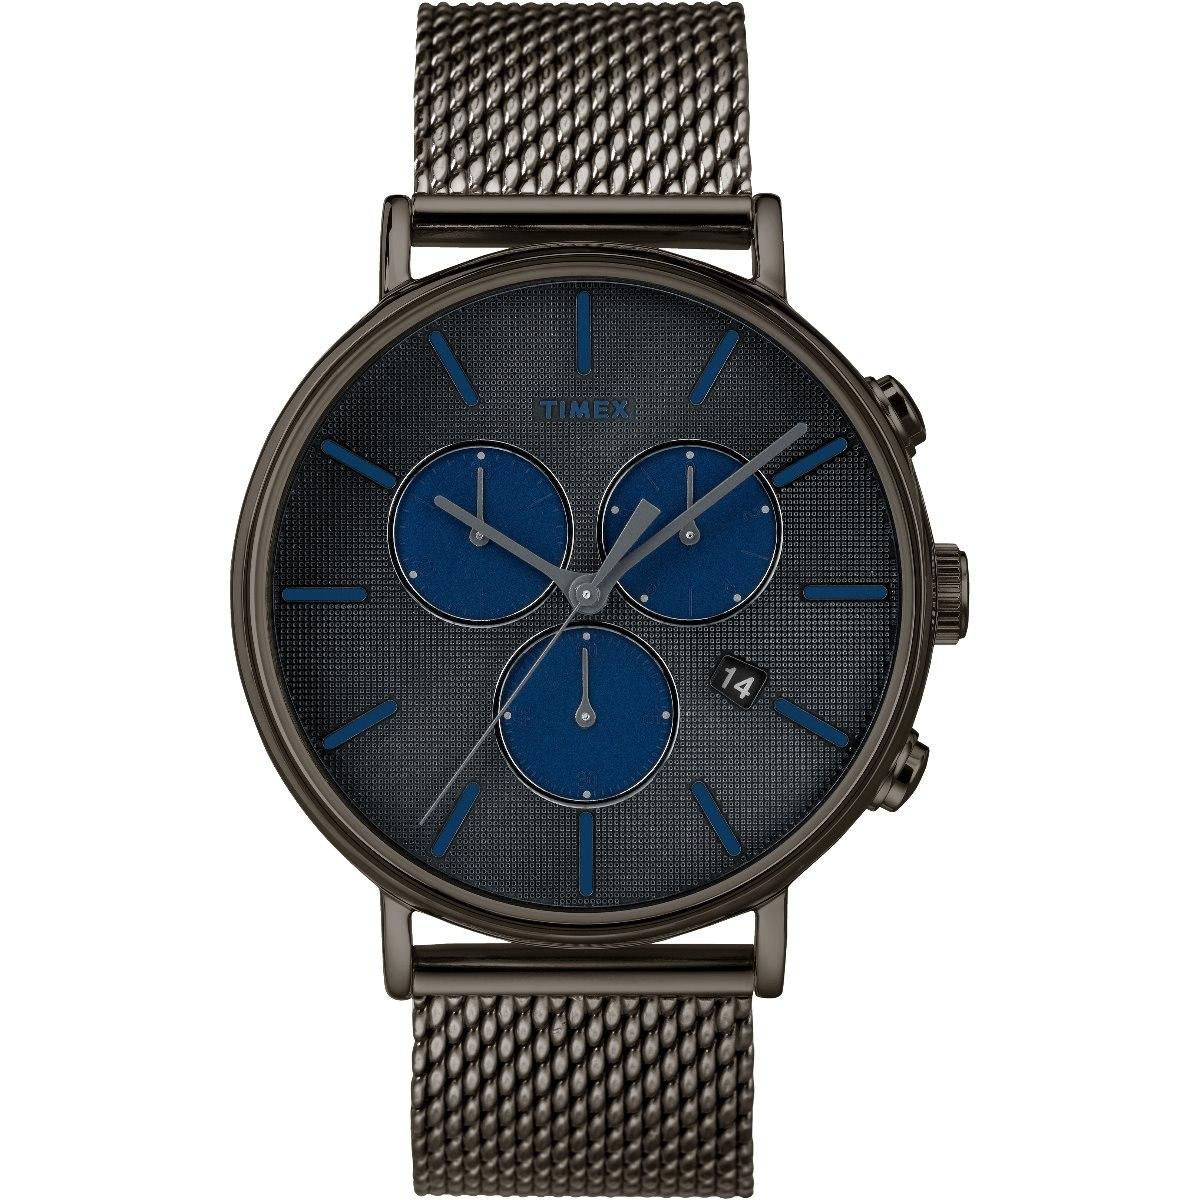 be86a1a4c052 reloj timex fairfield supernova tw2r98000 negro crono hombre. Cargando zoom.